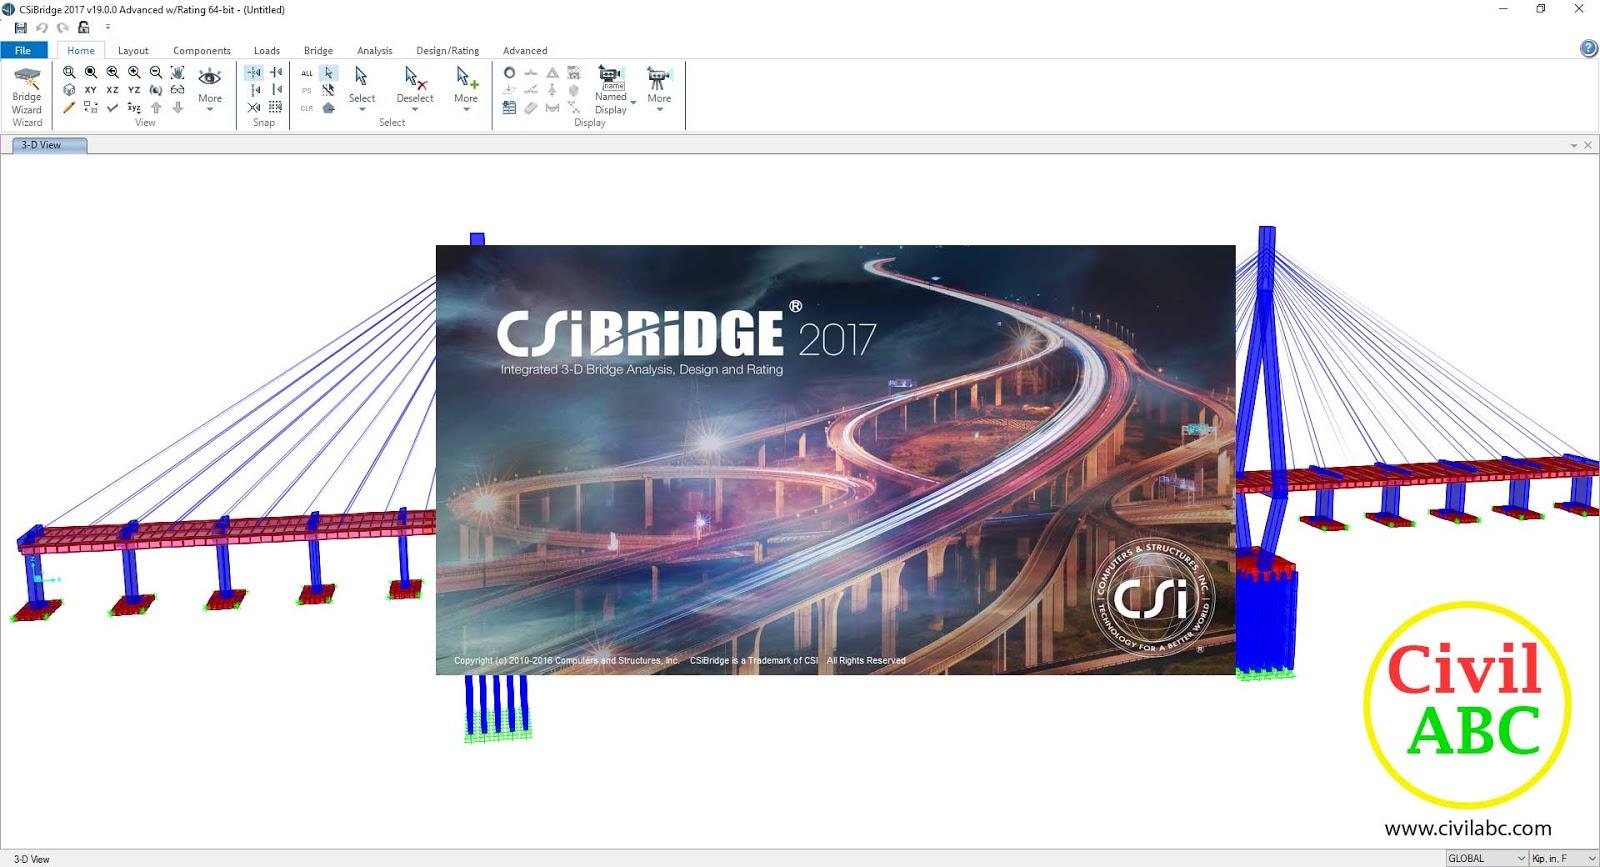 CSiBridge 2017 v19 2 0 (x86/x64) Free Download - Civil